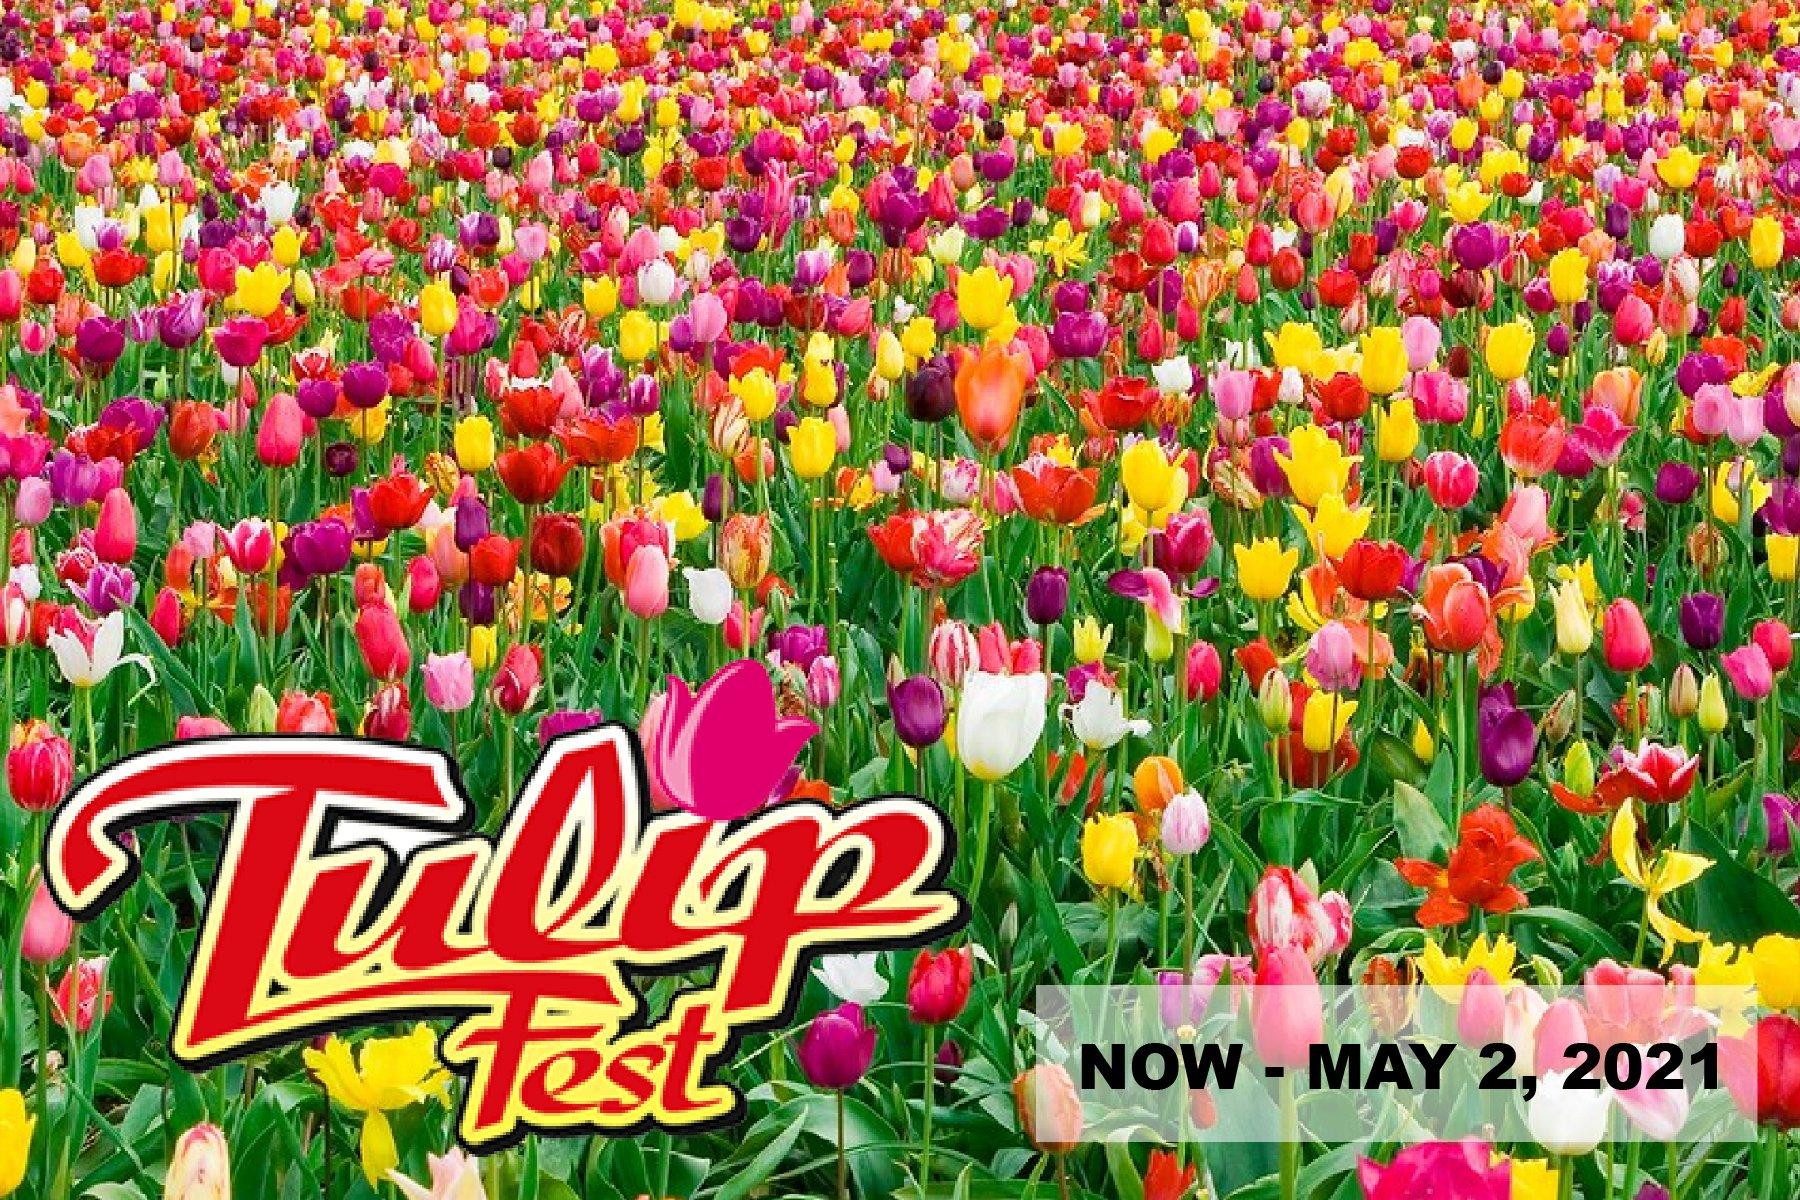 Wooden Shoe Tulip Festival 2021